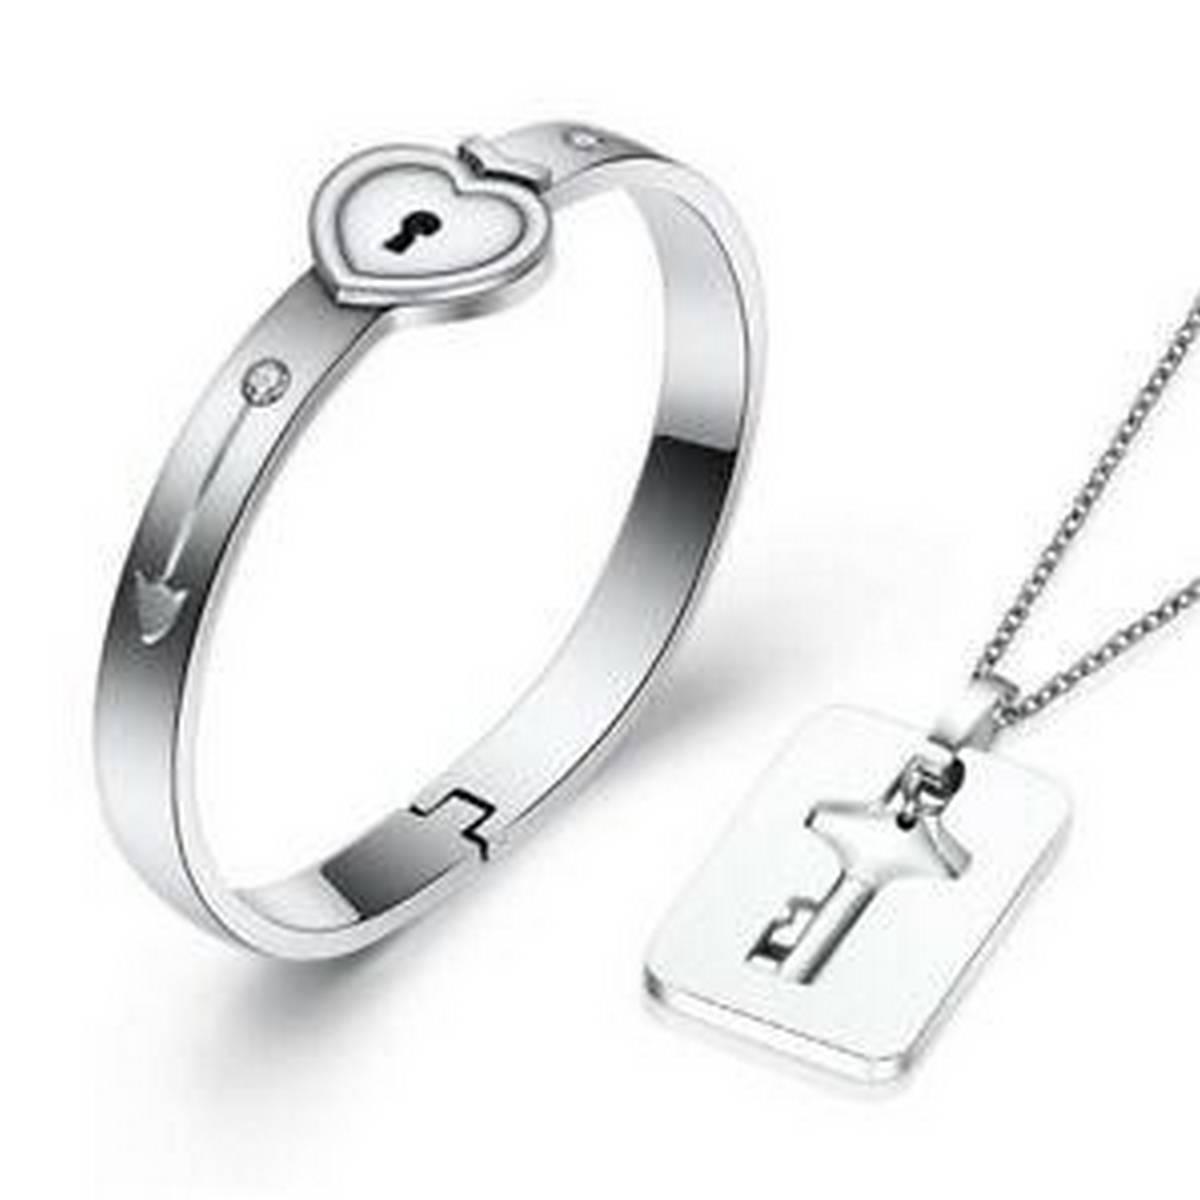 Darojay True Love Heart Lock Bracelets Bangles Key Pendant Necklace Couples